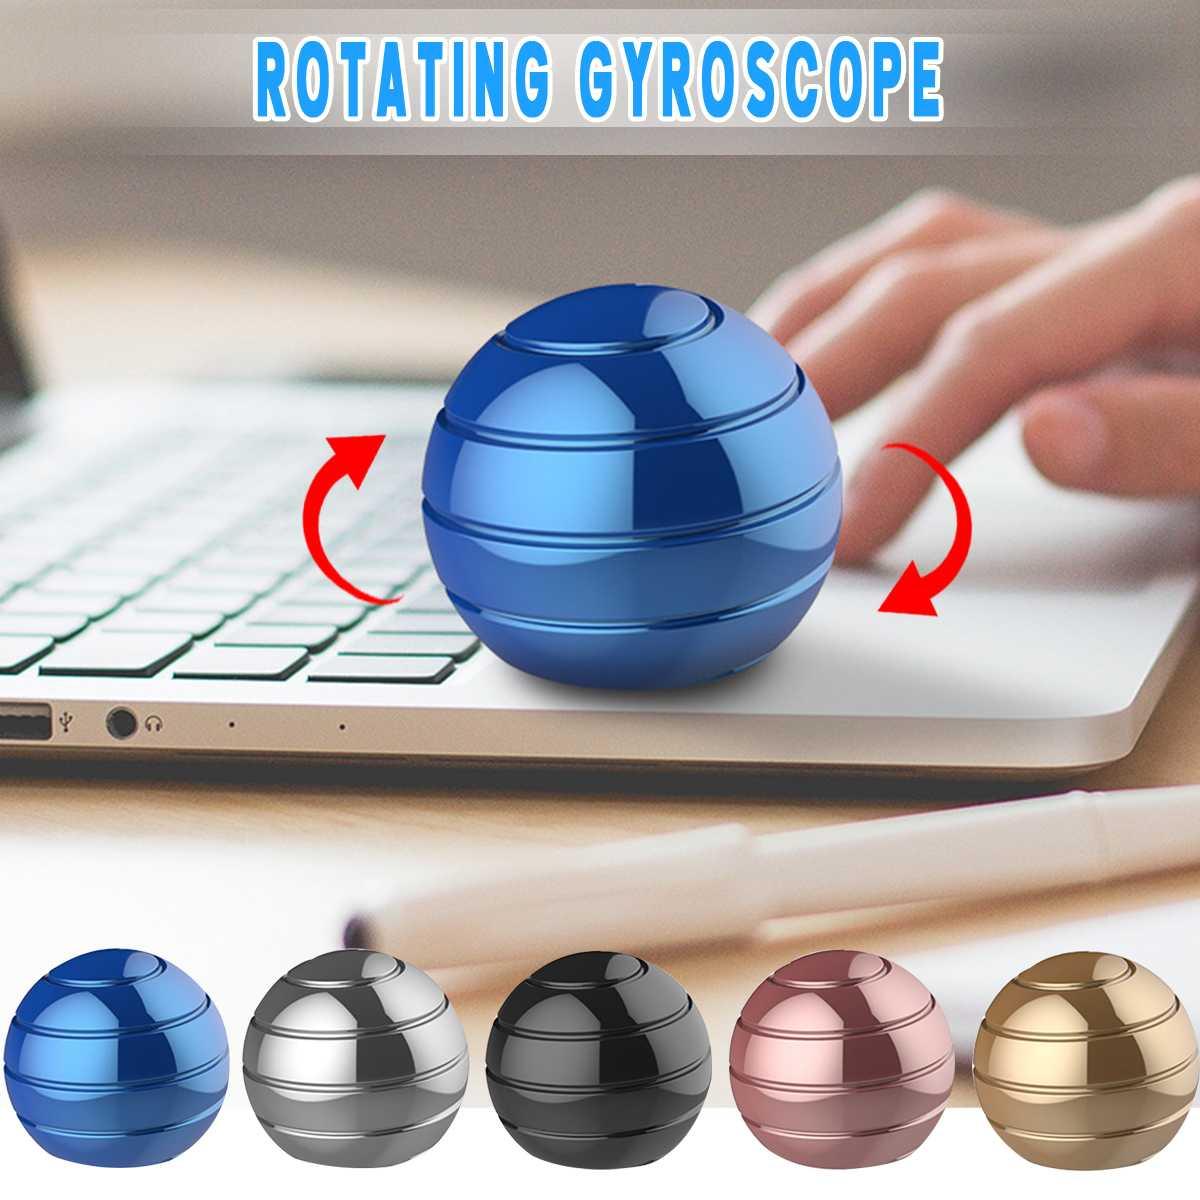 Detachable Rotating Spherical Gyroscope